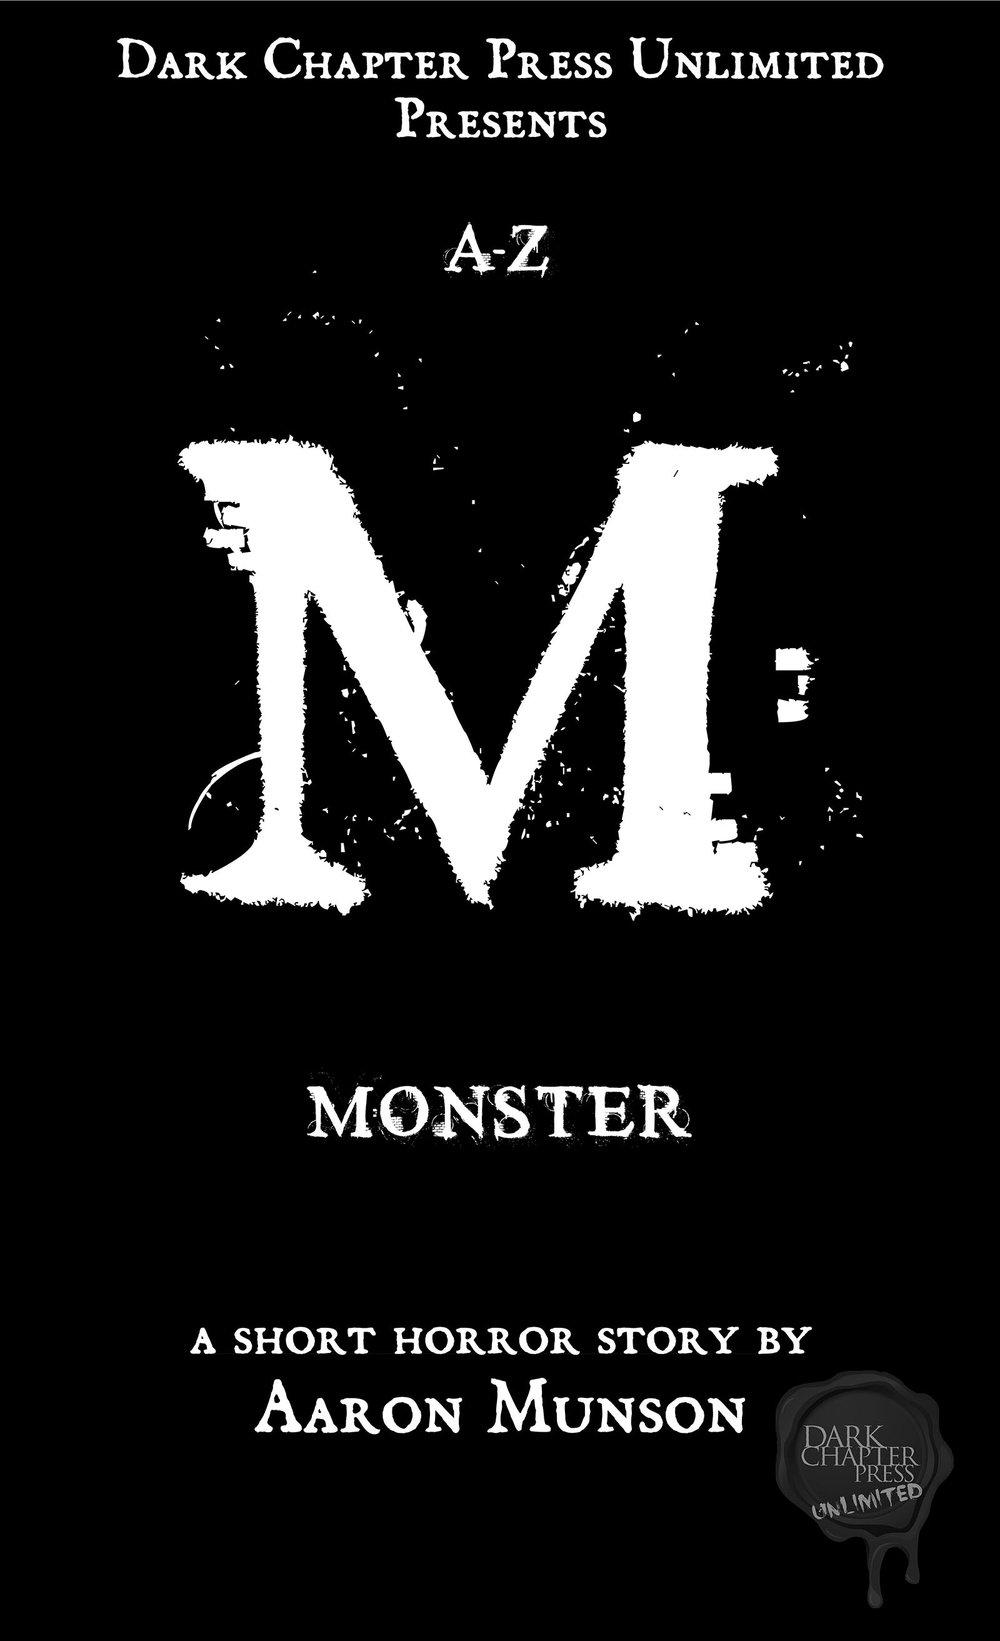 AtoZ-M-Monster-Aaron-Munson.jpg